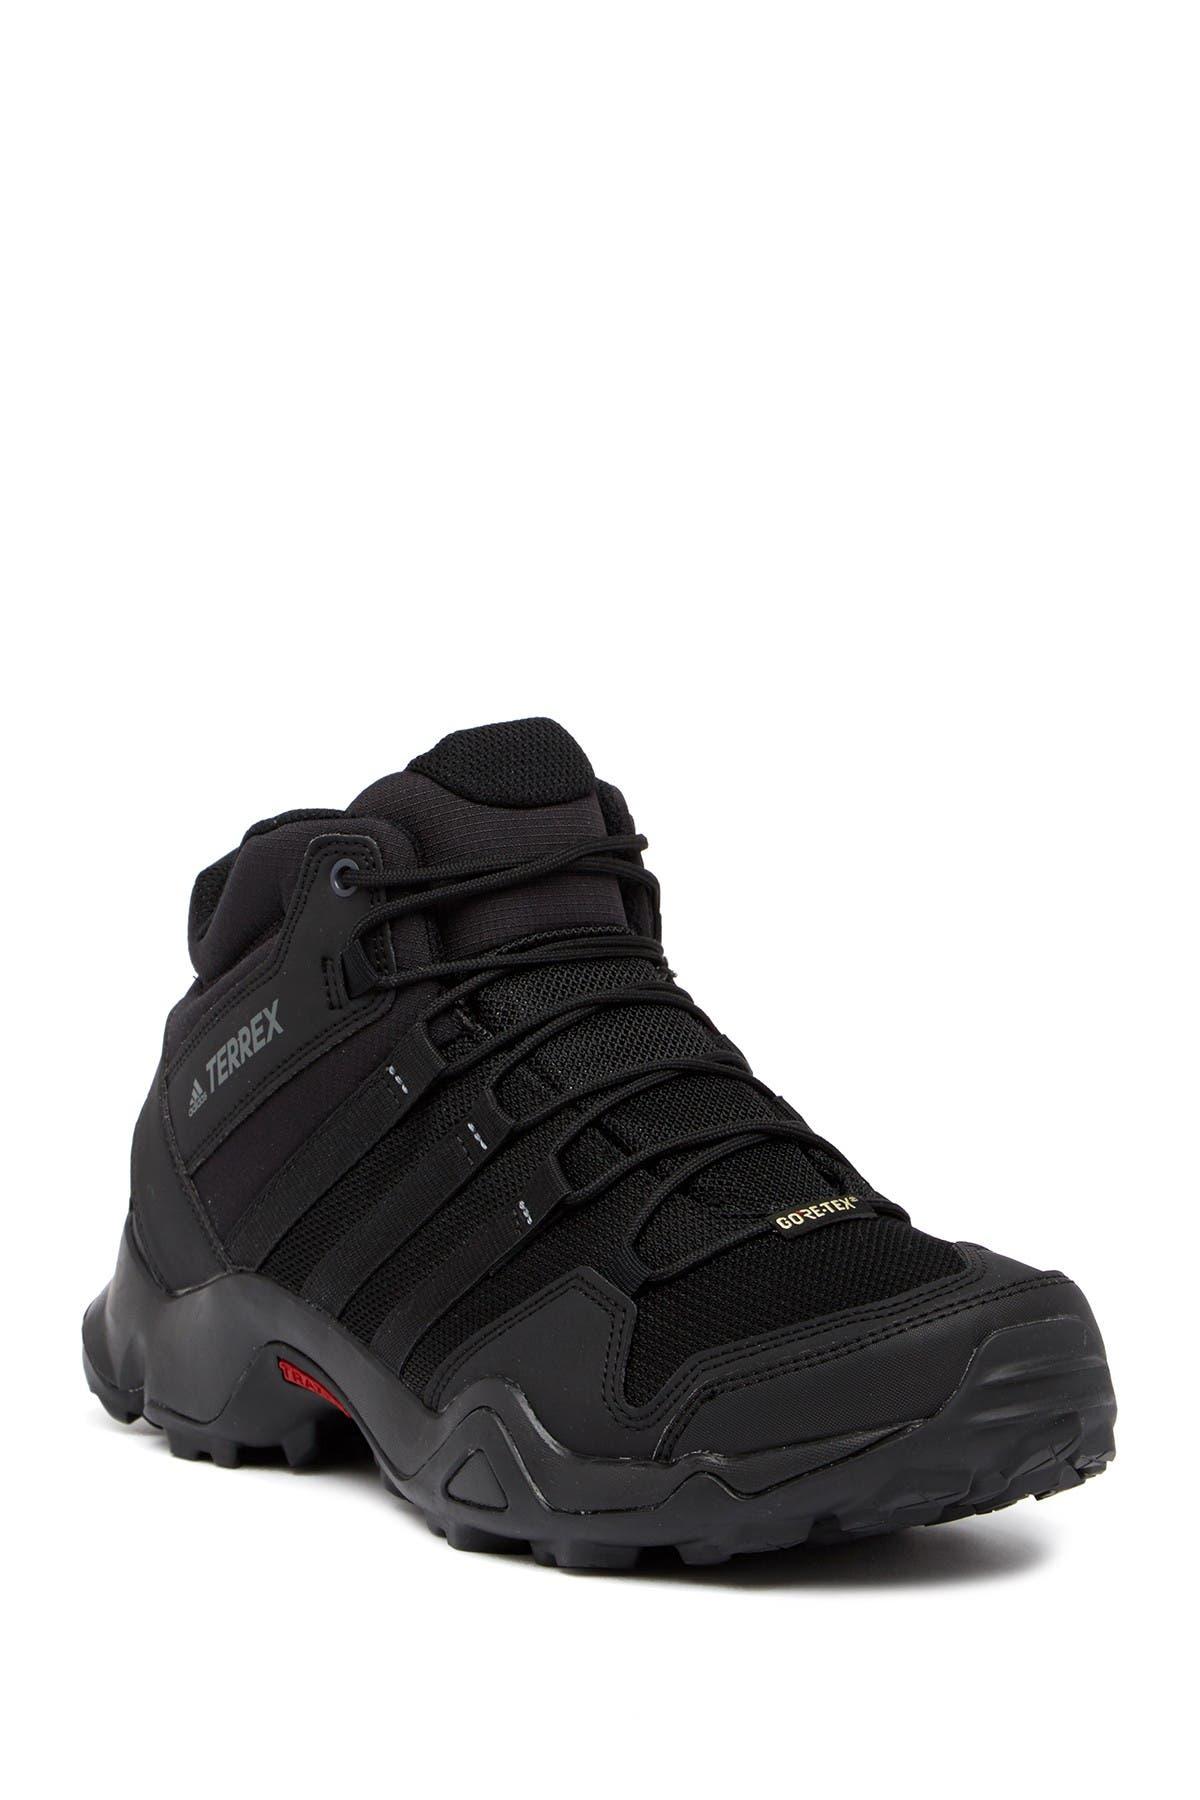 adidas | Terrex AX2R Mid GTX Sneaker